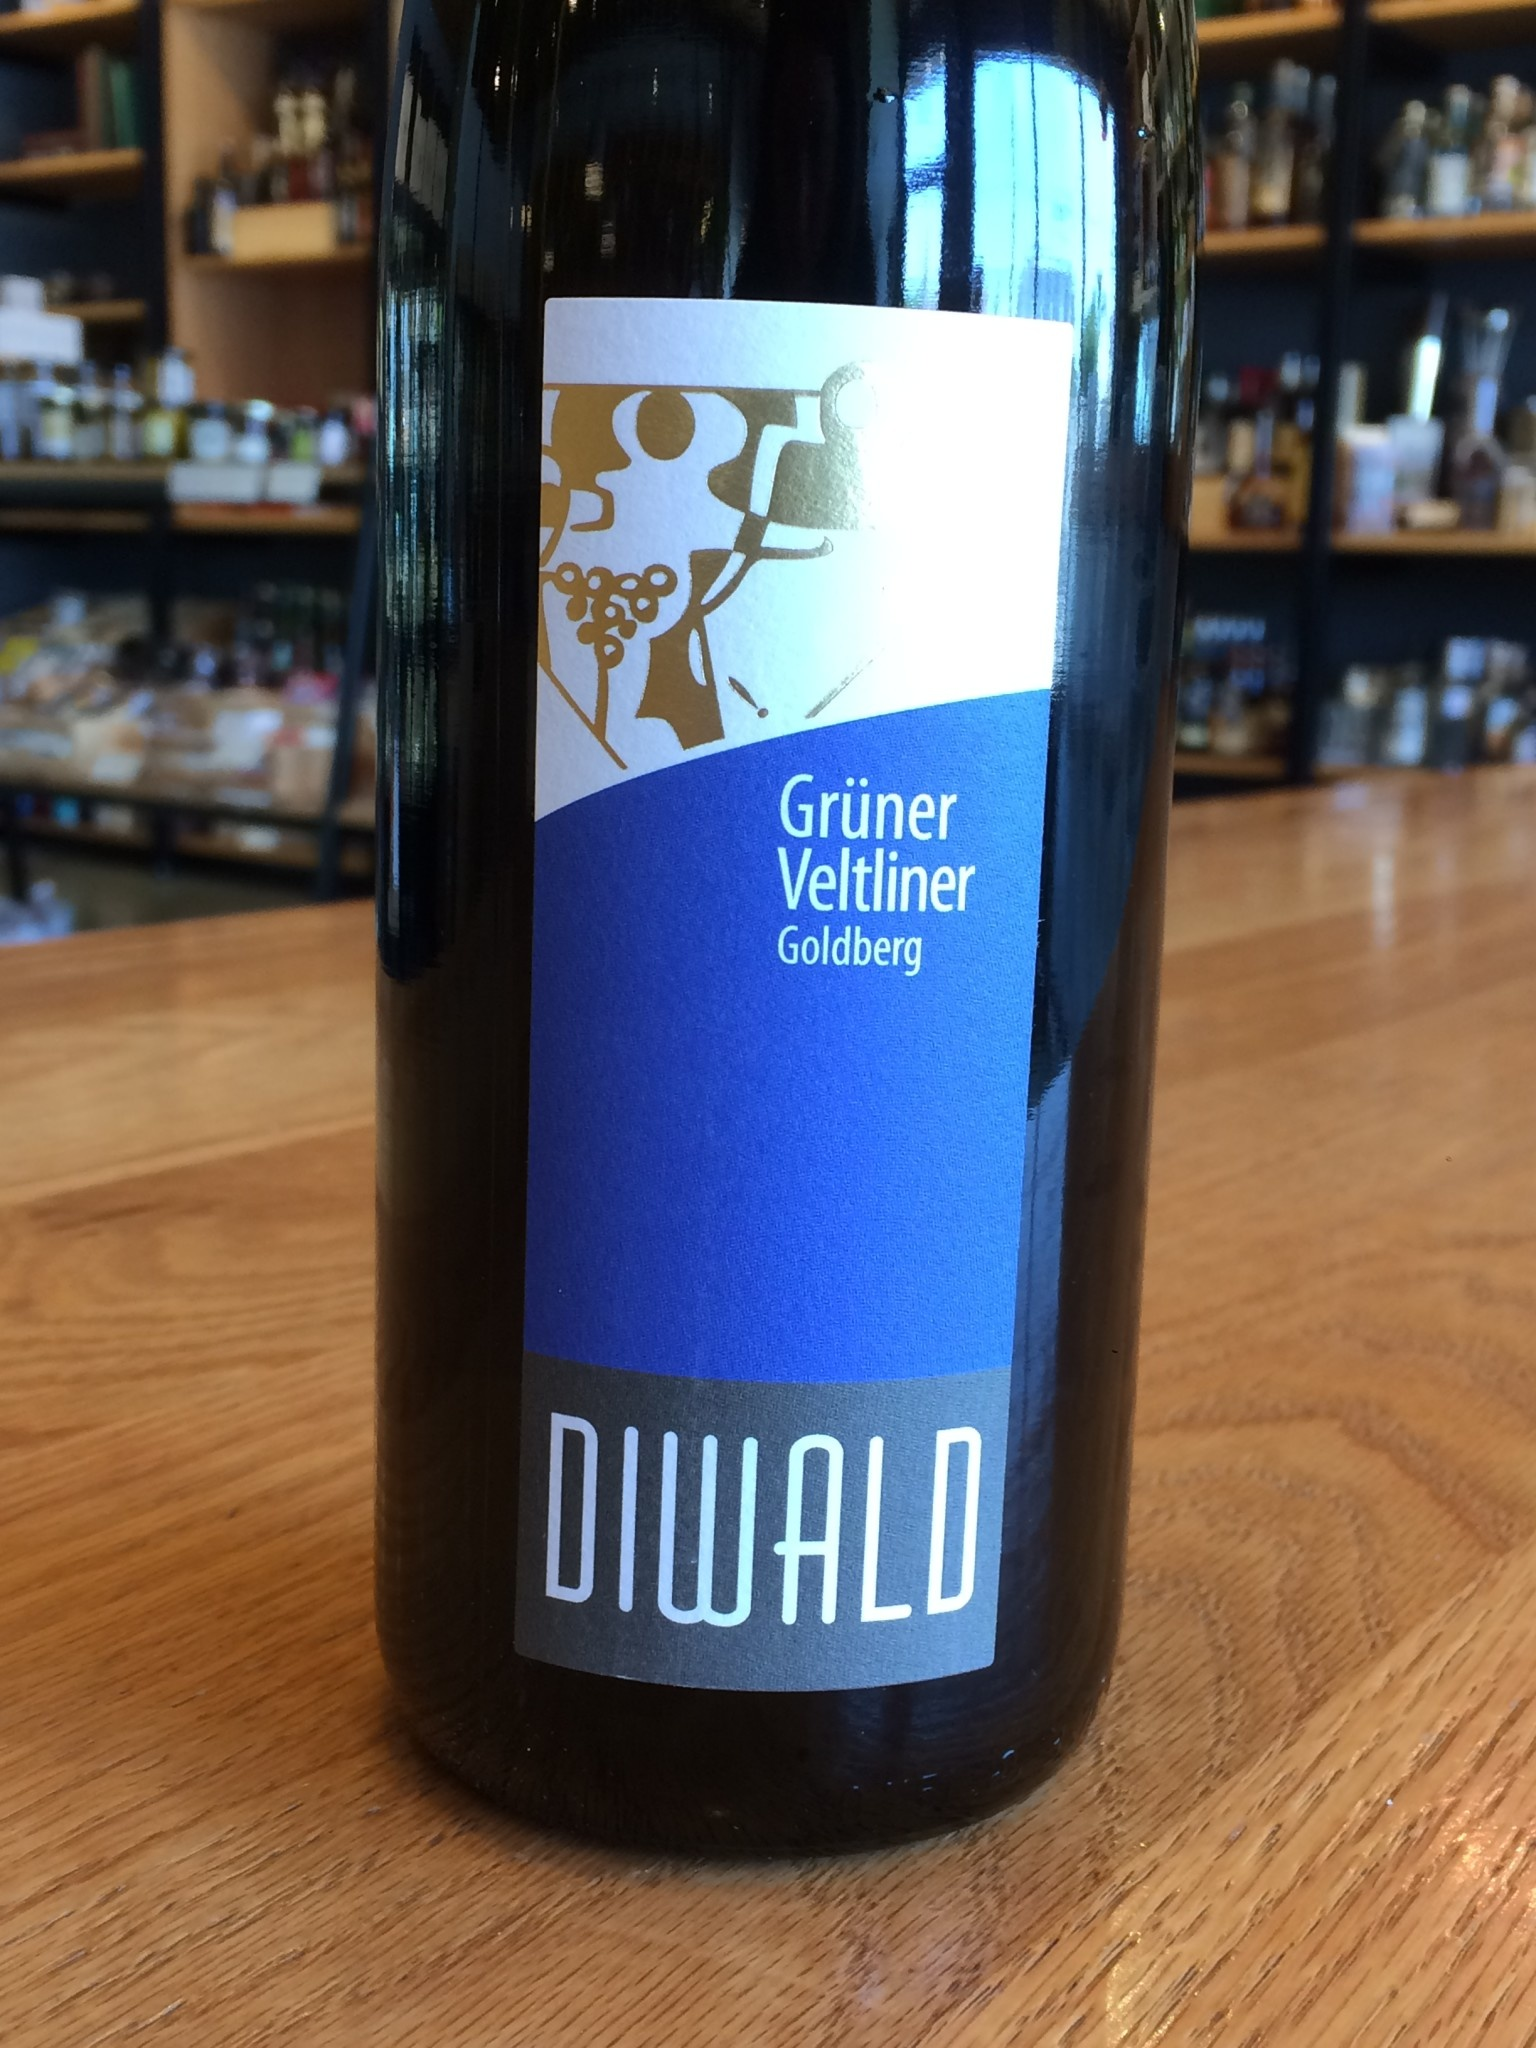 Diwald 2017 Diwald Grüner Veltliner 'Goldberg' 750ml